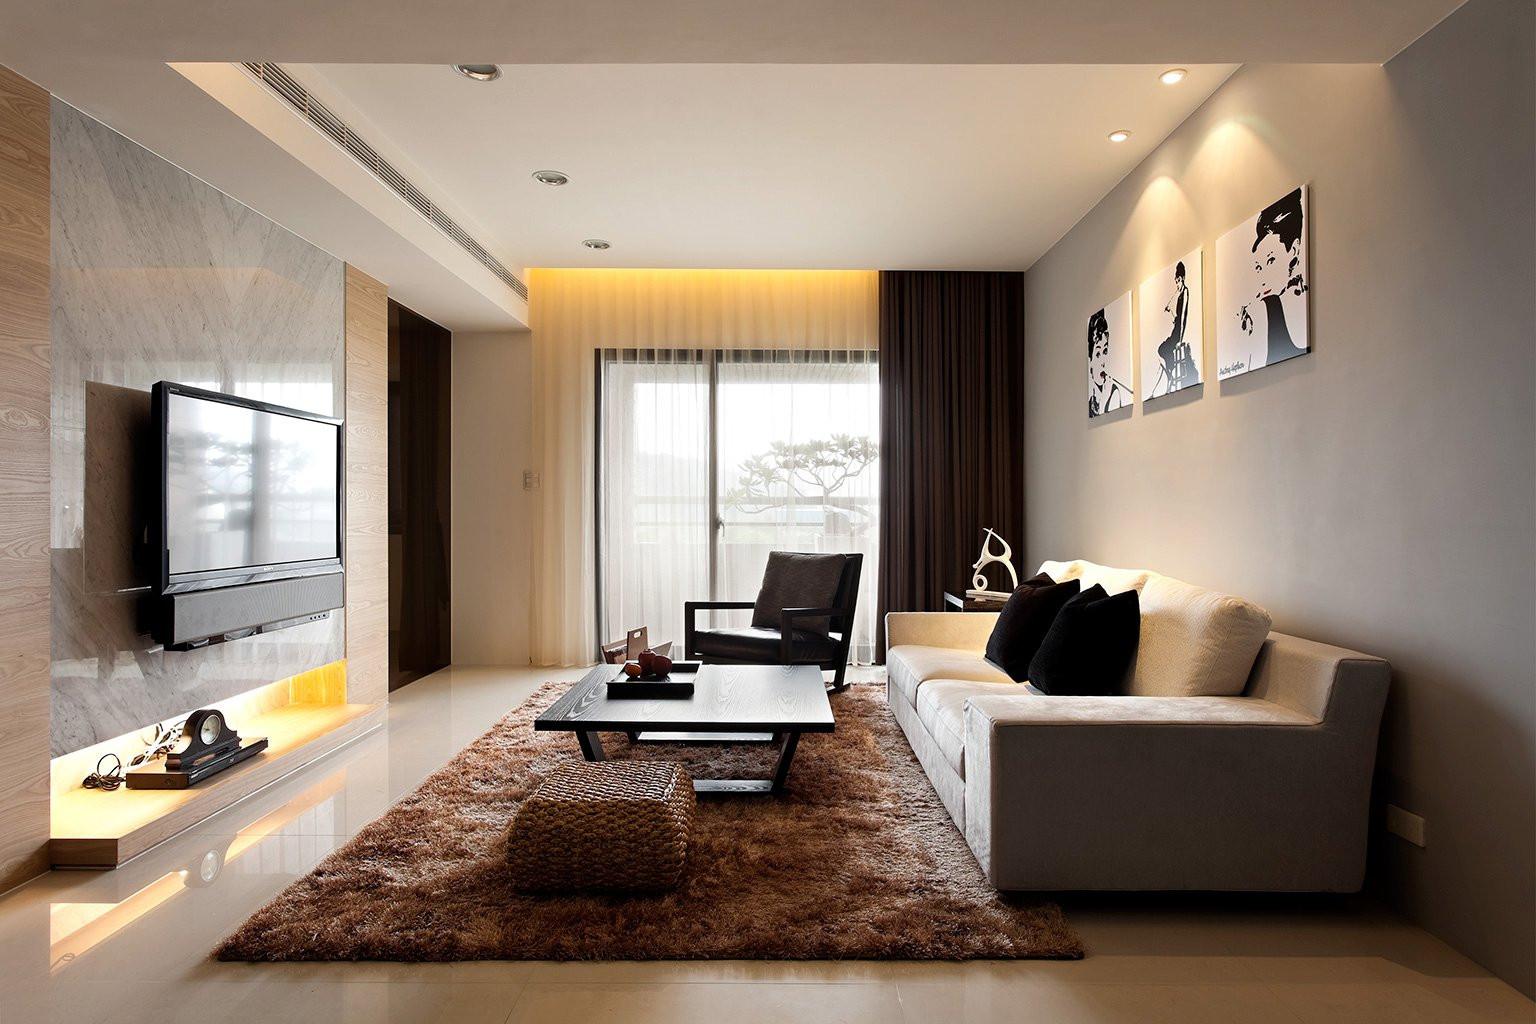 Modern Living Room  Modern Minimalist Decor with a Homey Flow